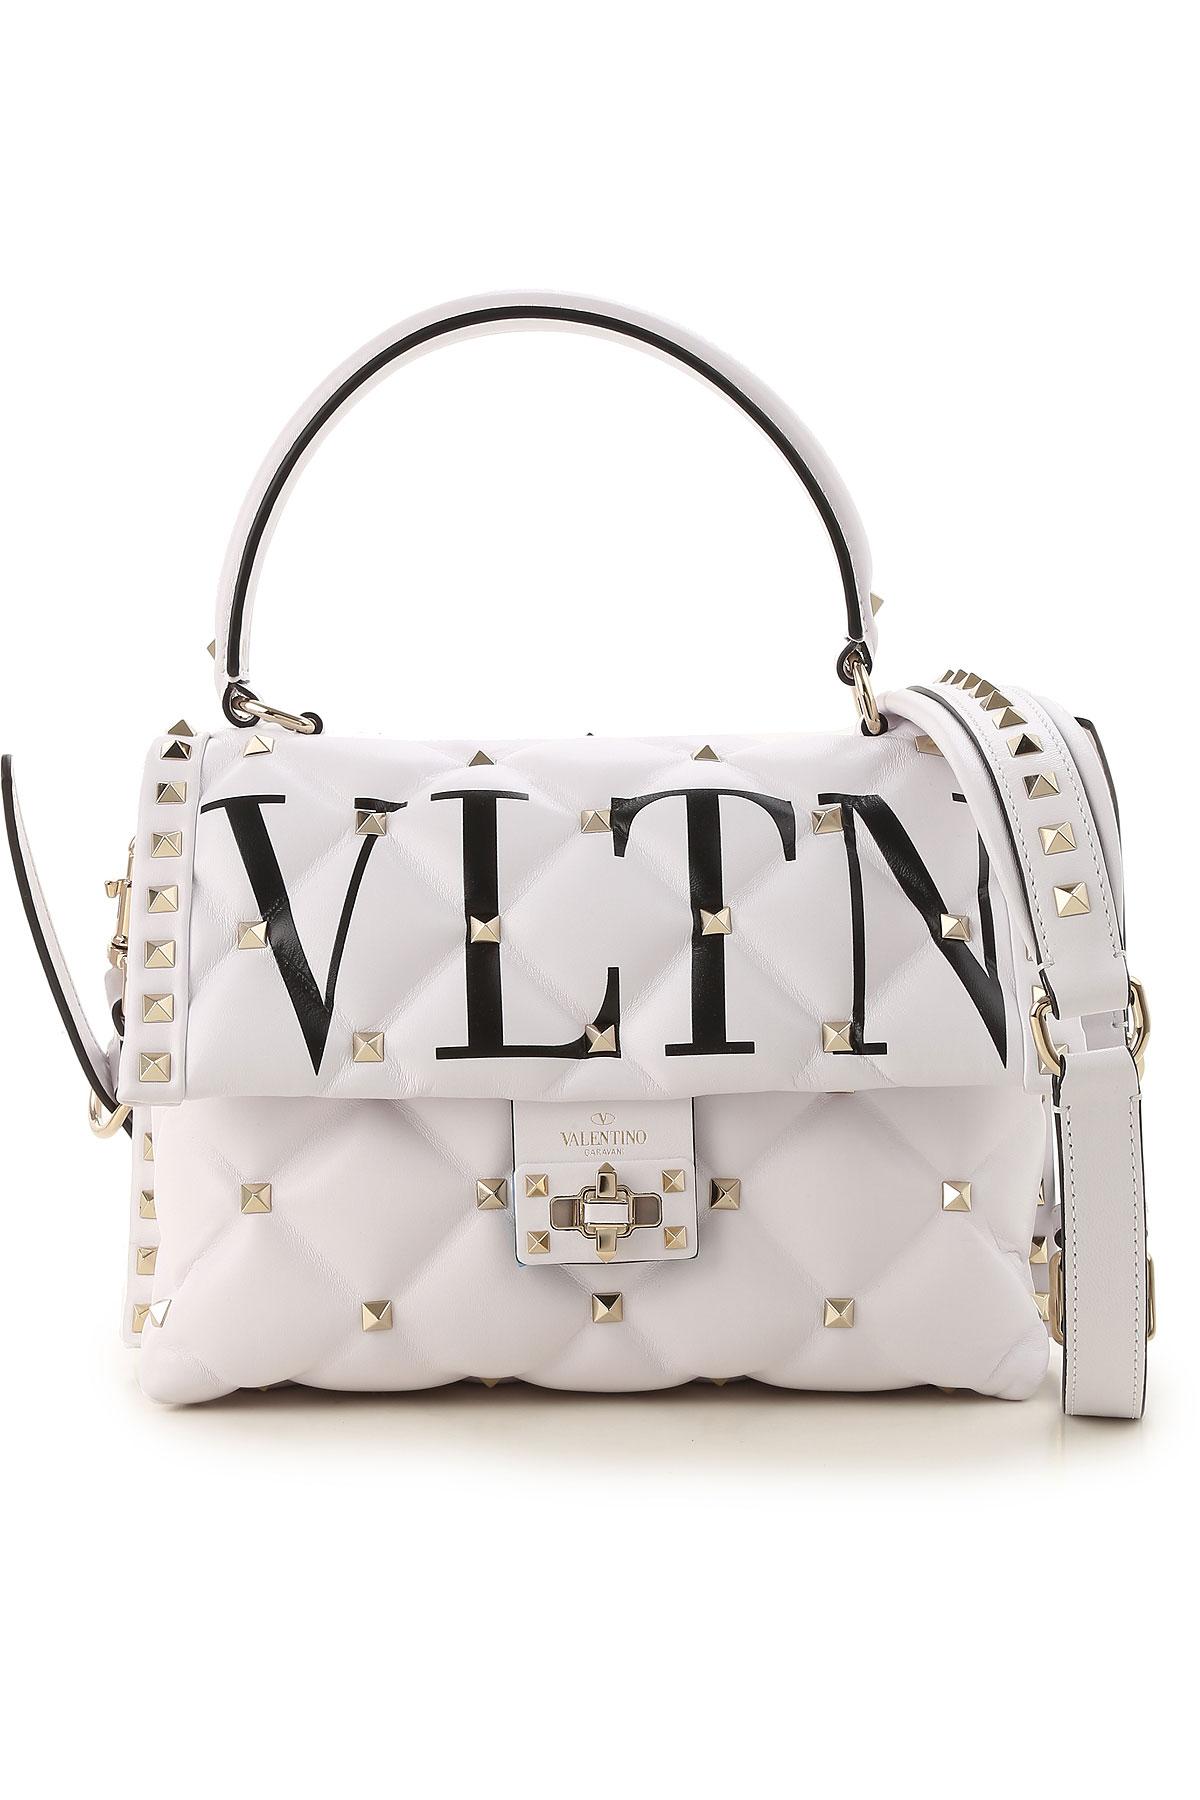 Valentino Top Handle Handbag, White, Leather, 2017 USA-469342